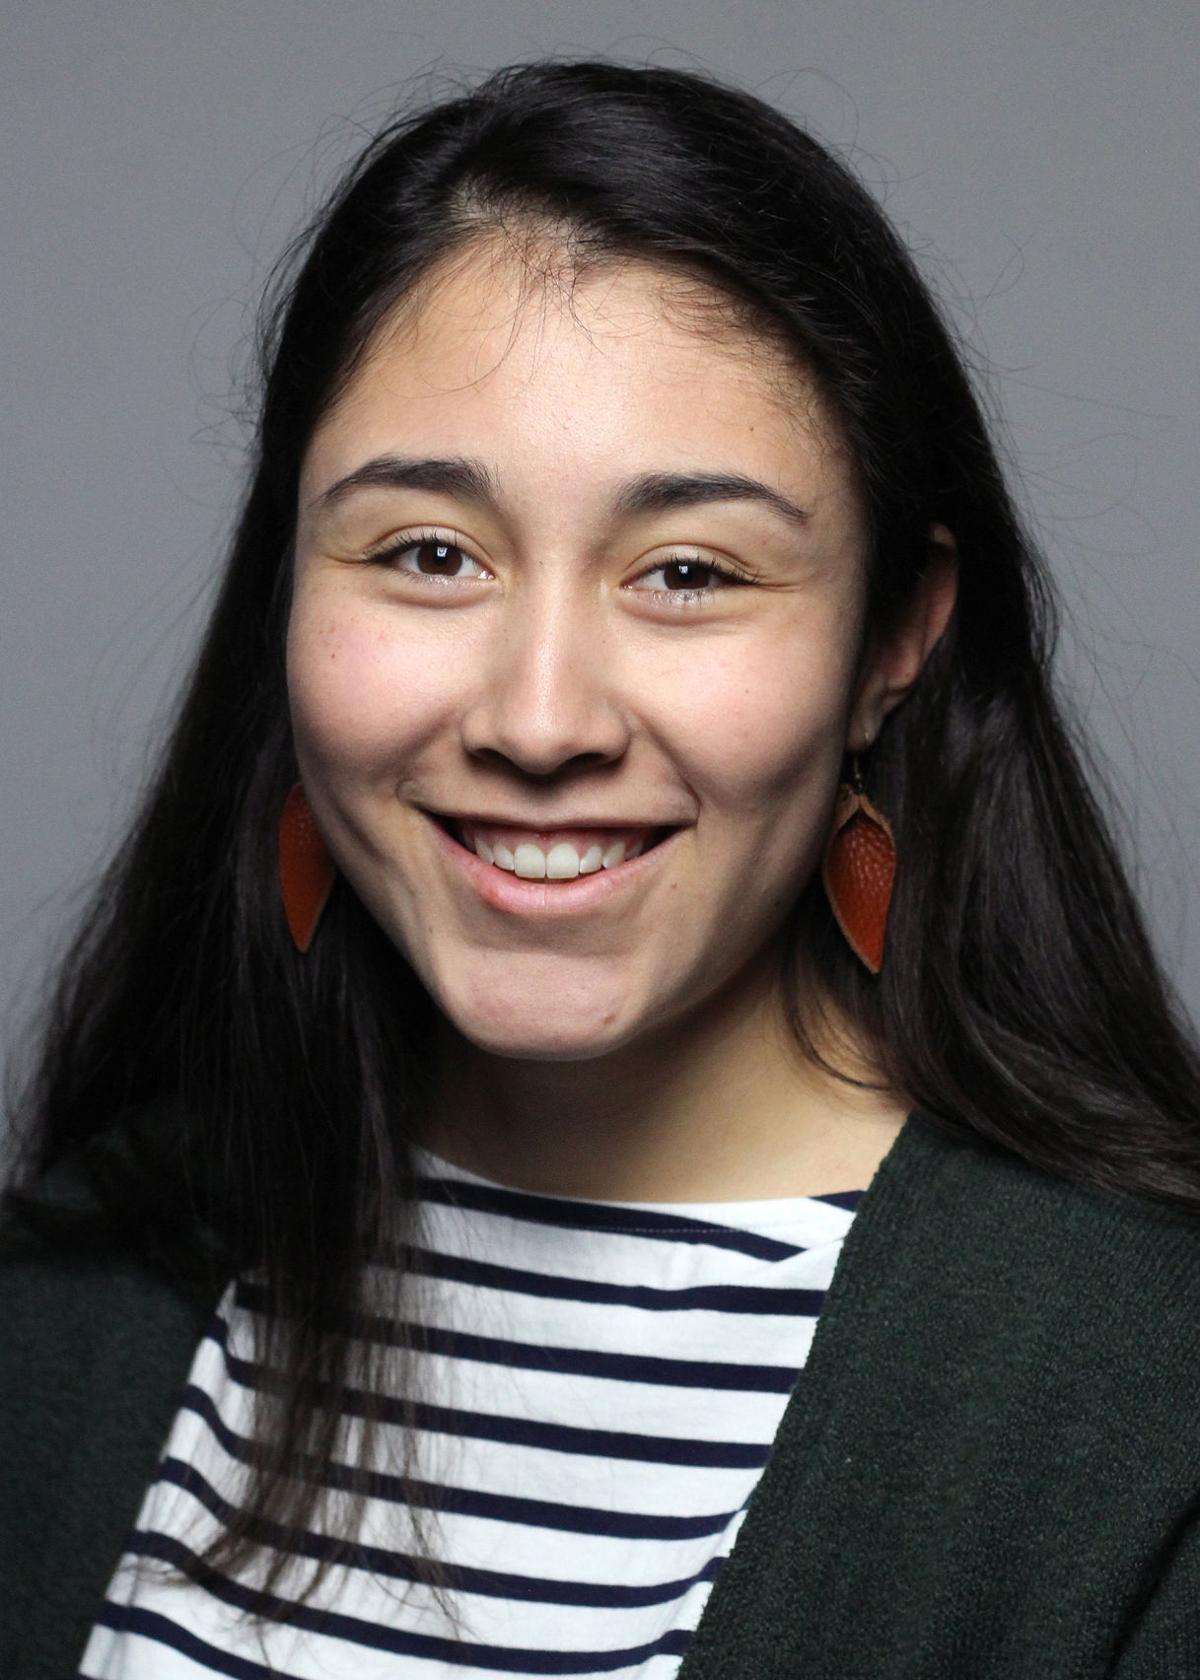 Megan Cardona